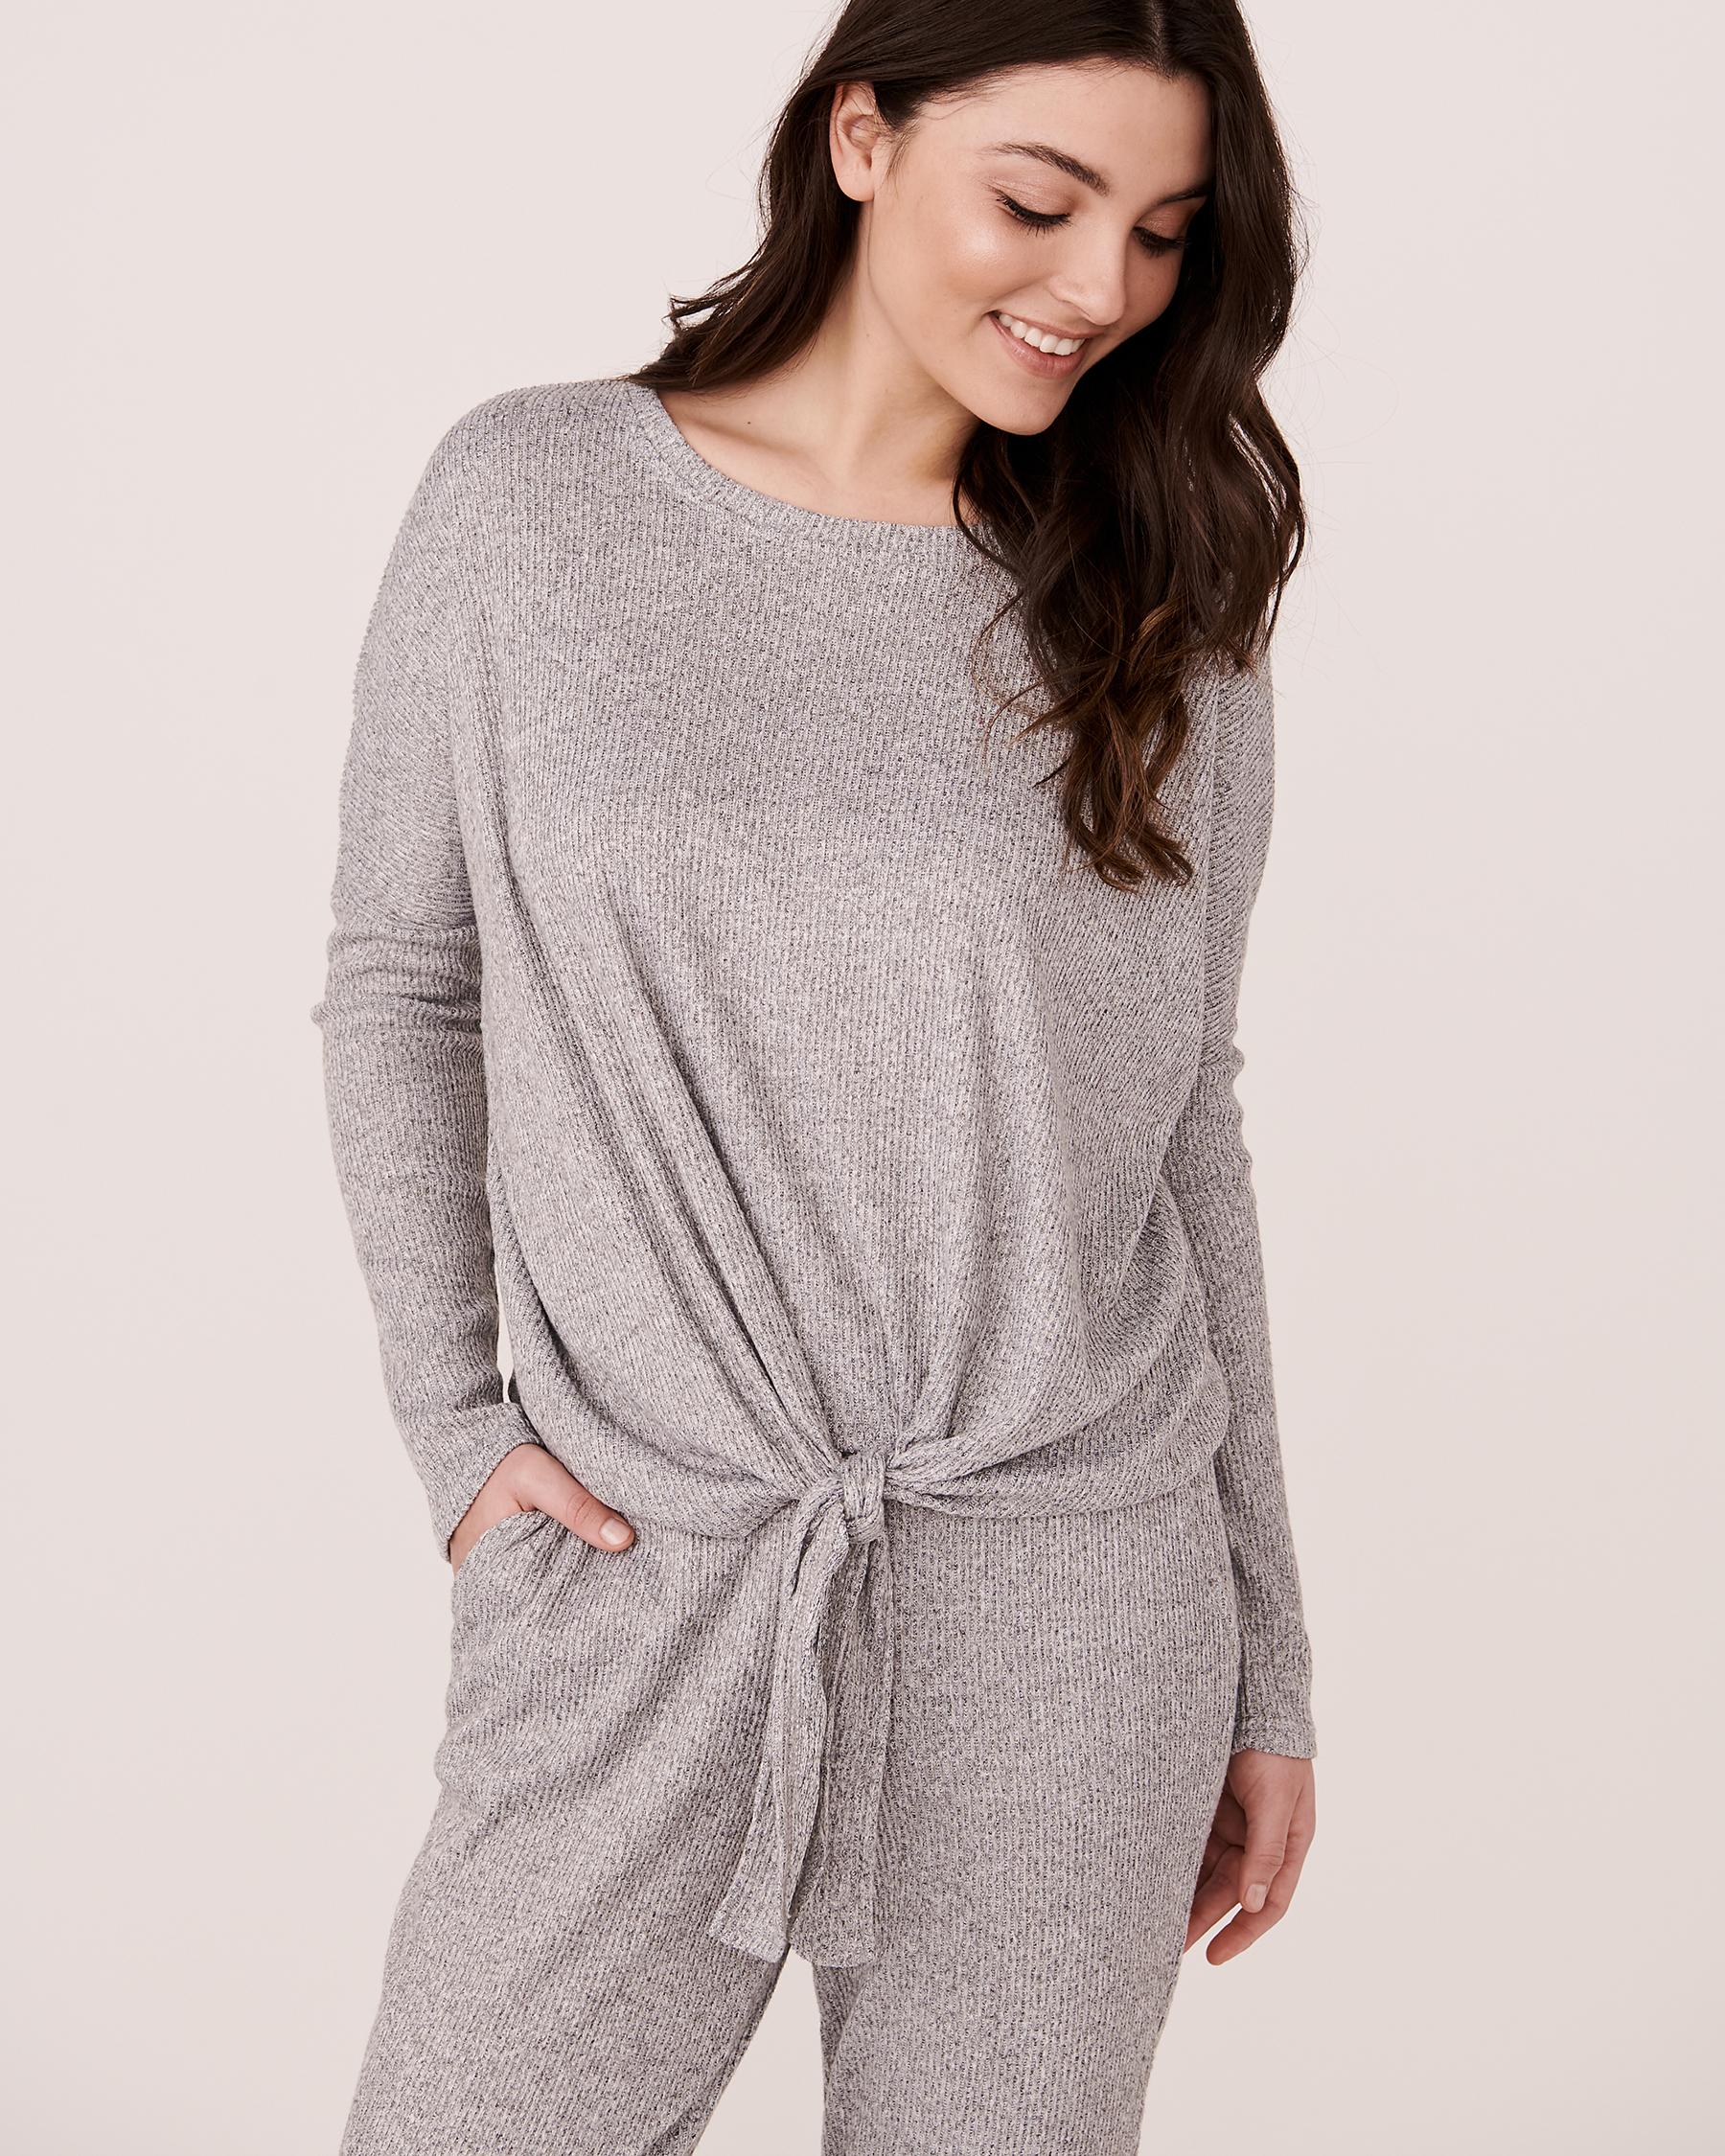 LA VIE EN ROSE Ribbed Long Sleeve Shirt Grey 774-473-0-04 - View1